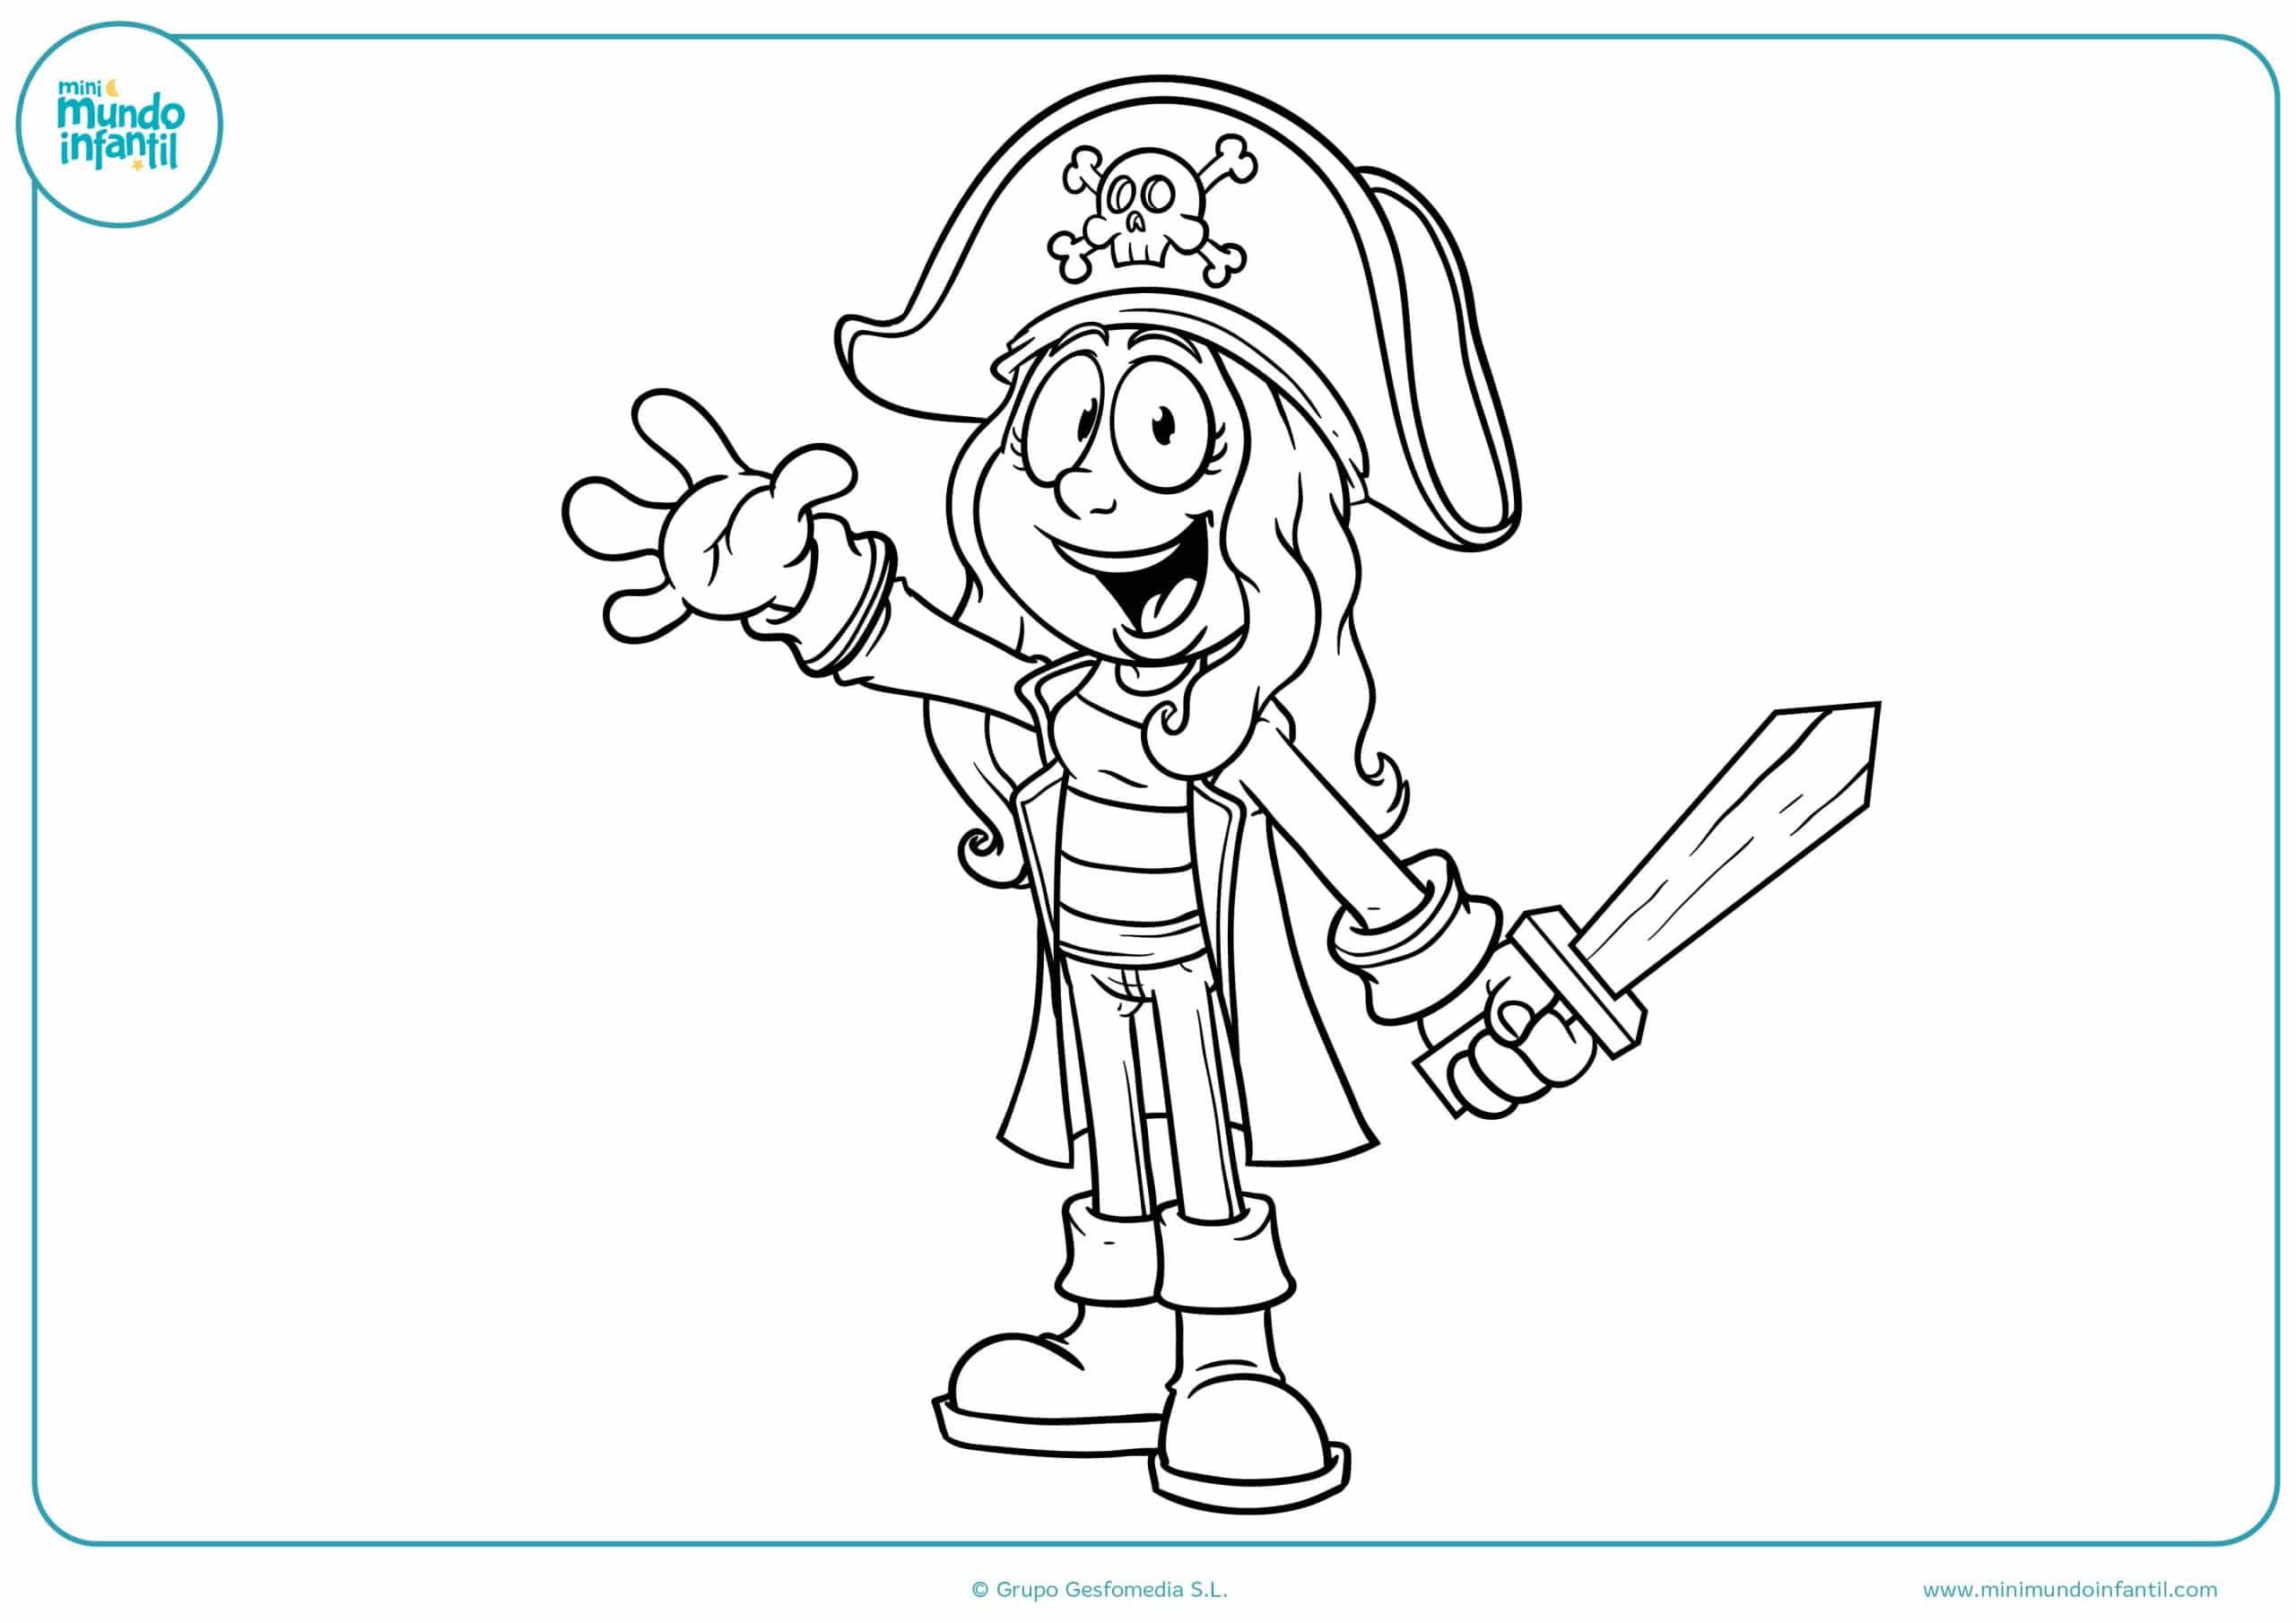 Dibujos de Piratas para colorear - Mundo Primaria